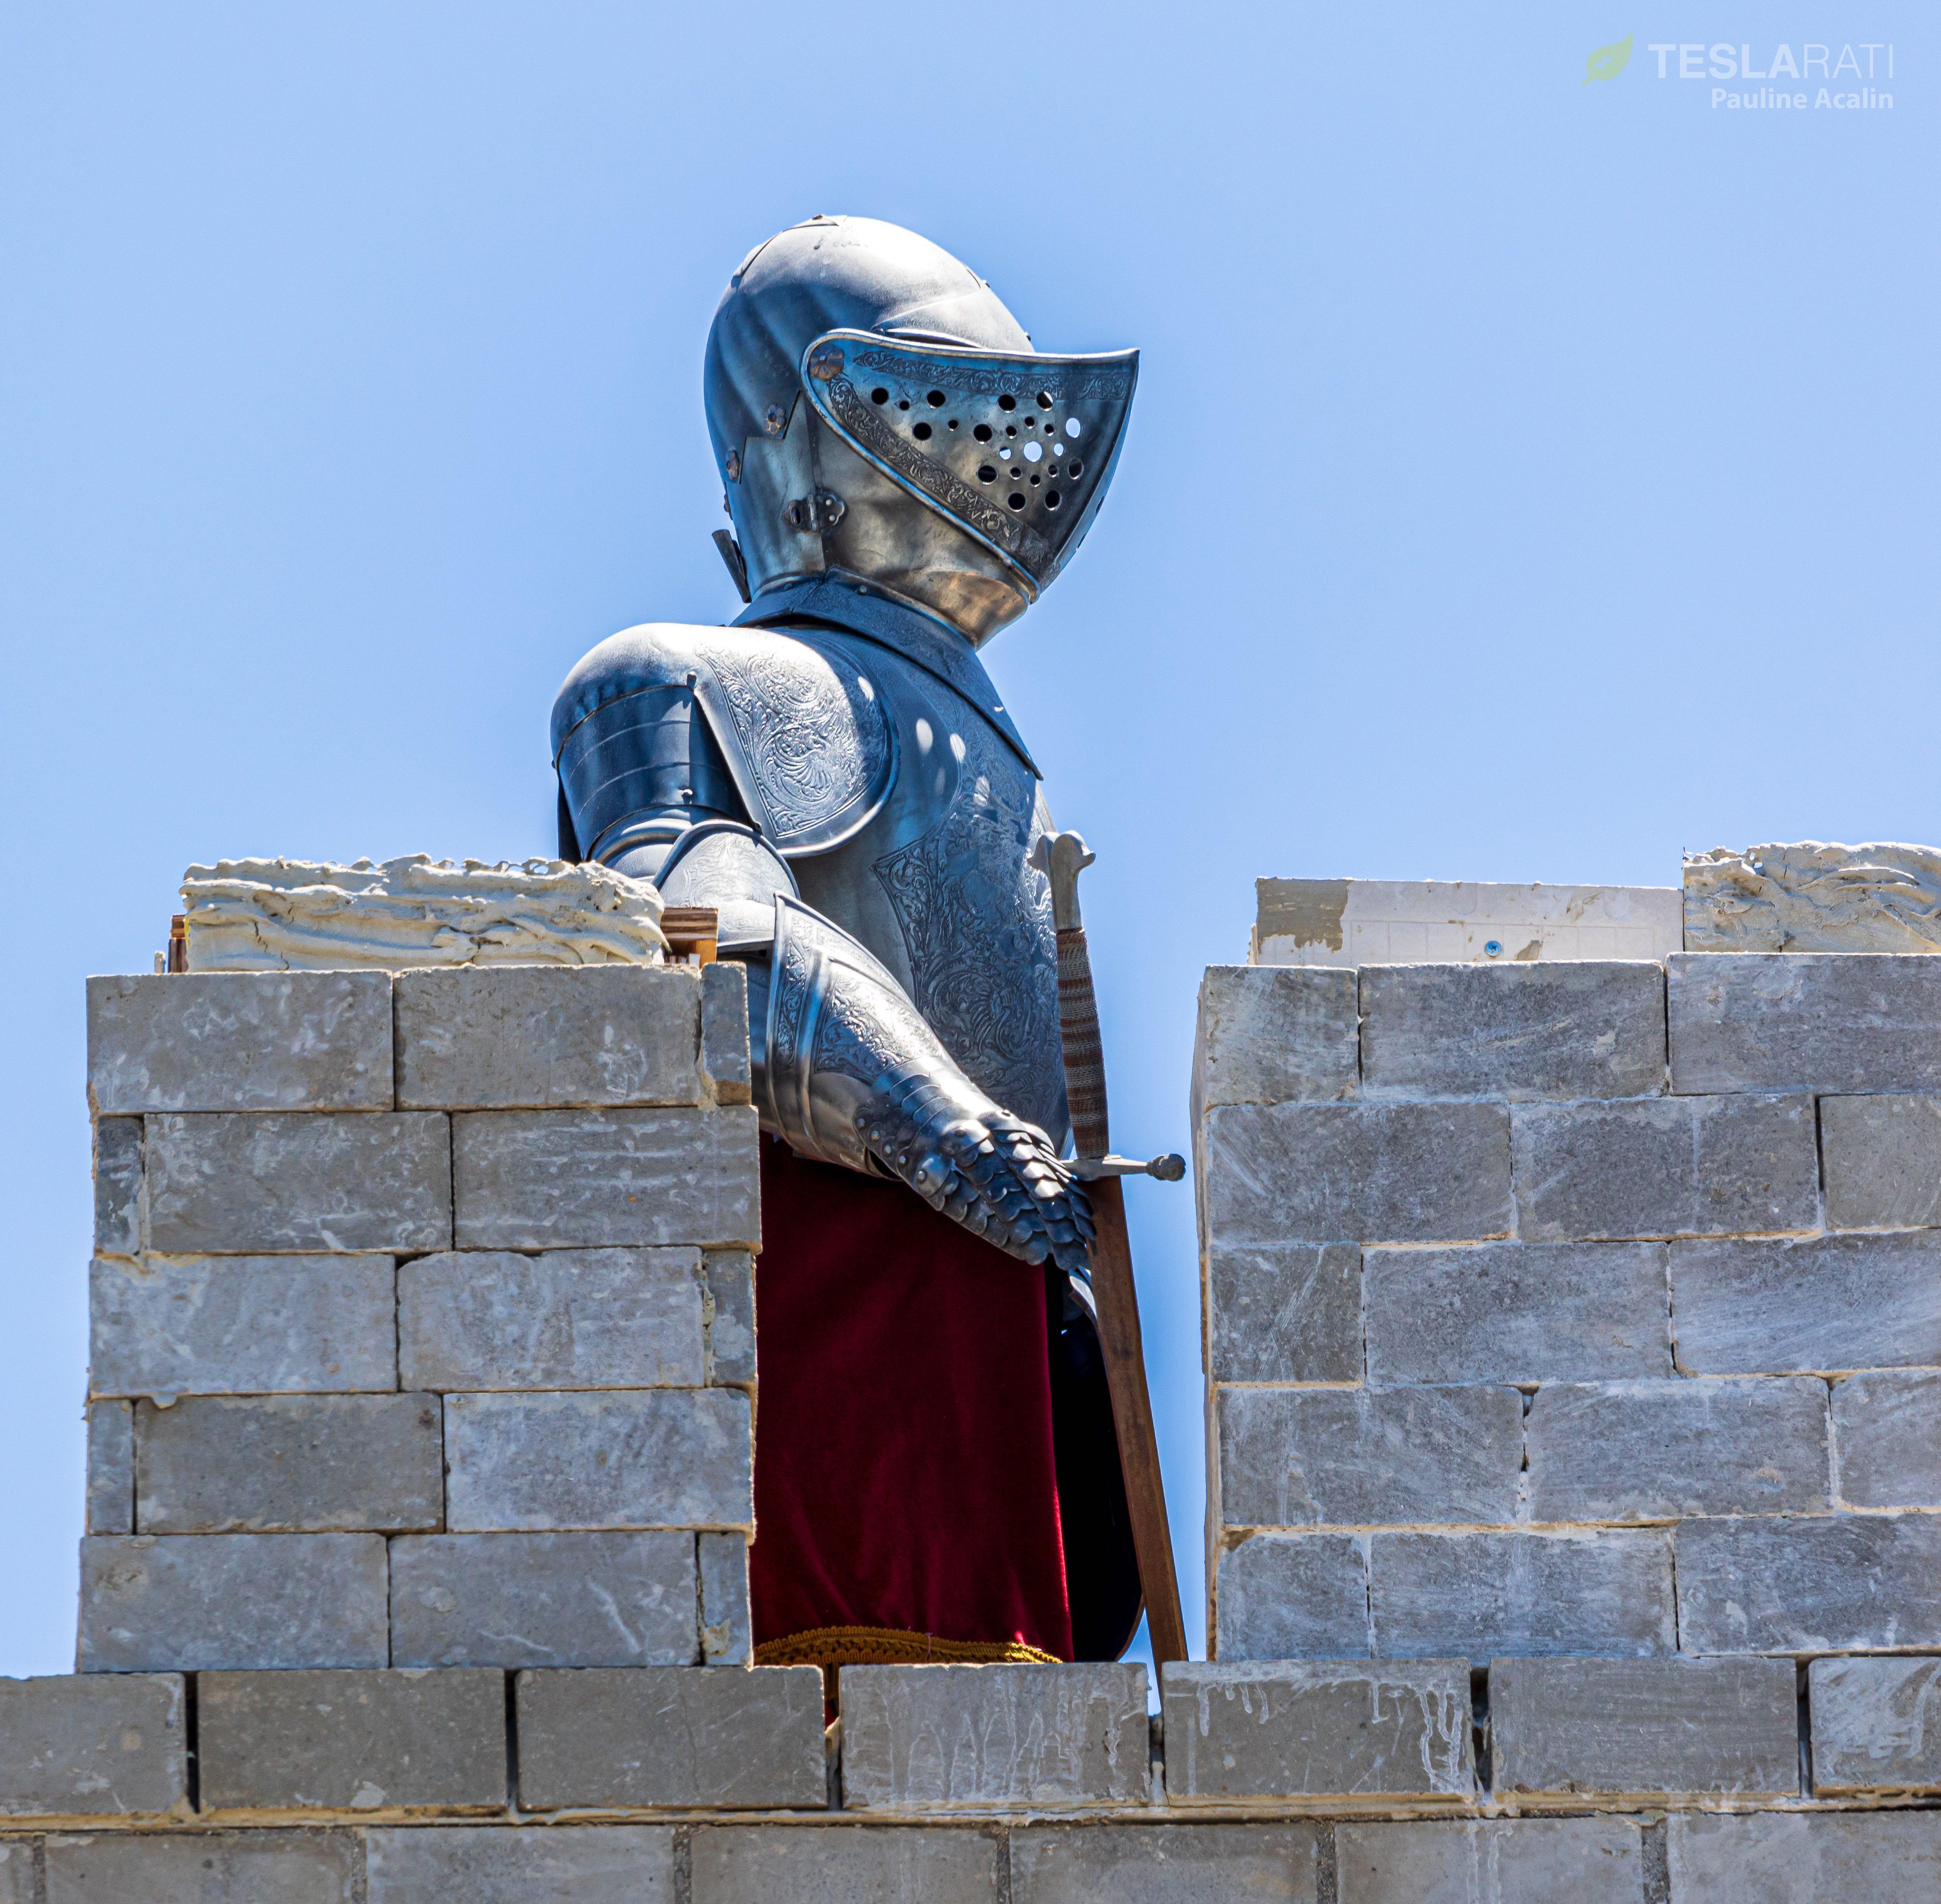 TBM-tower-knight-Pauline-Acalin-0519-2